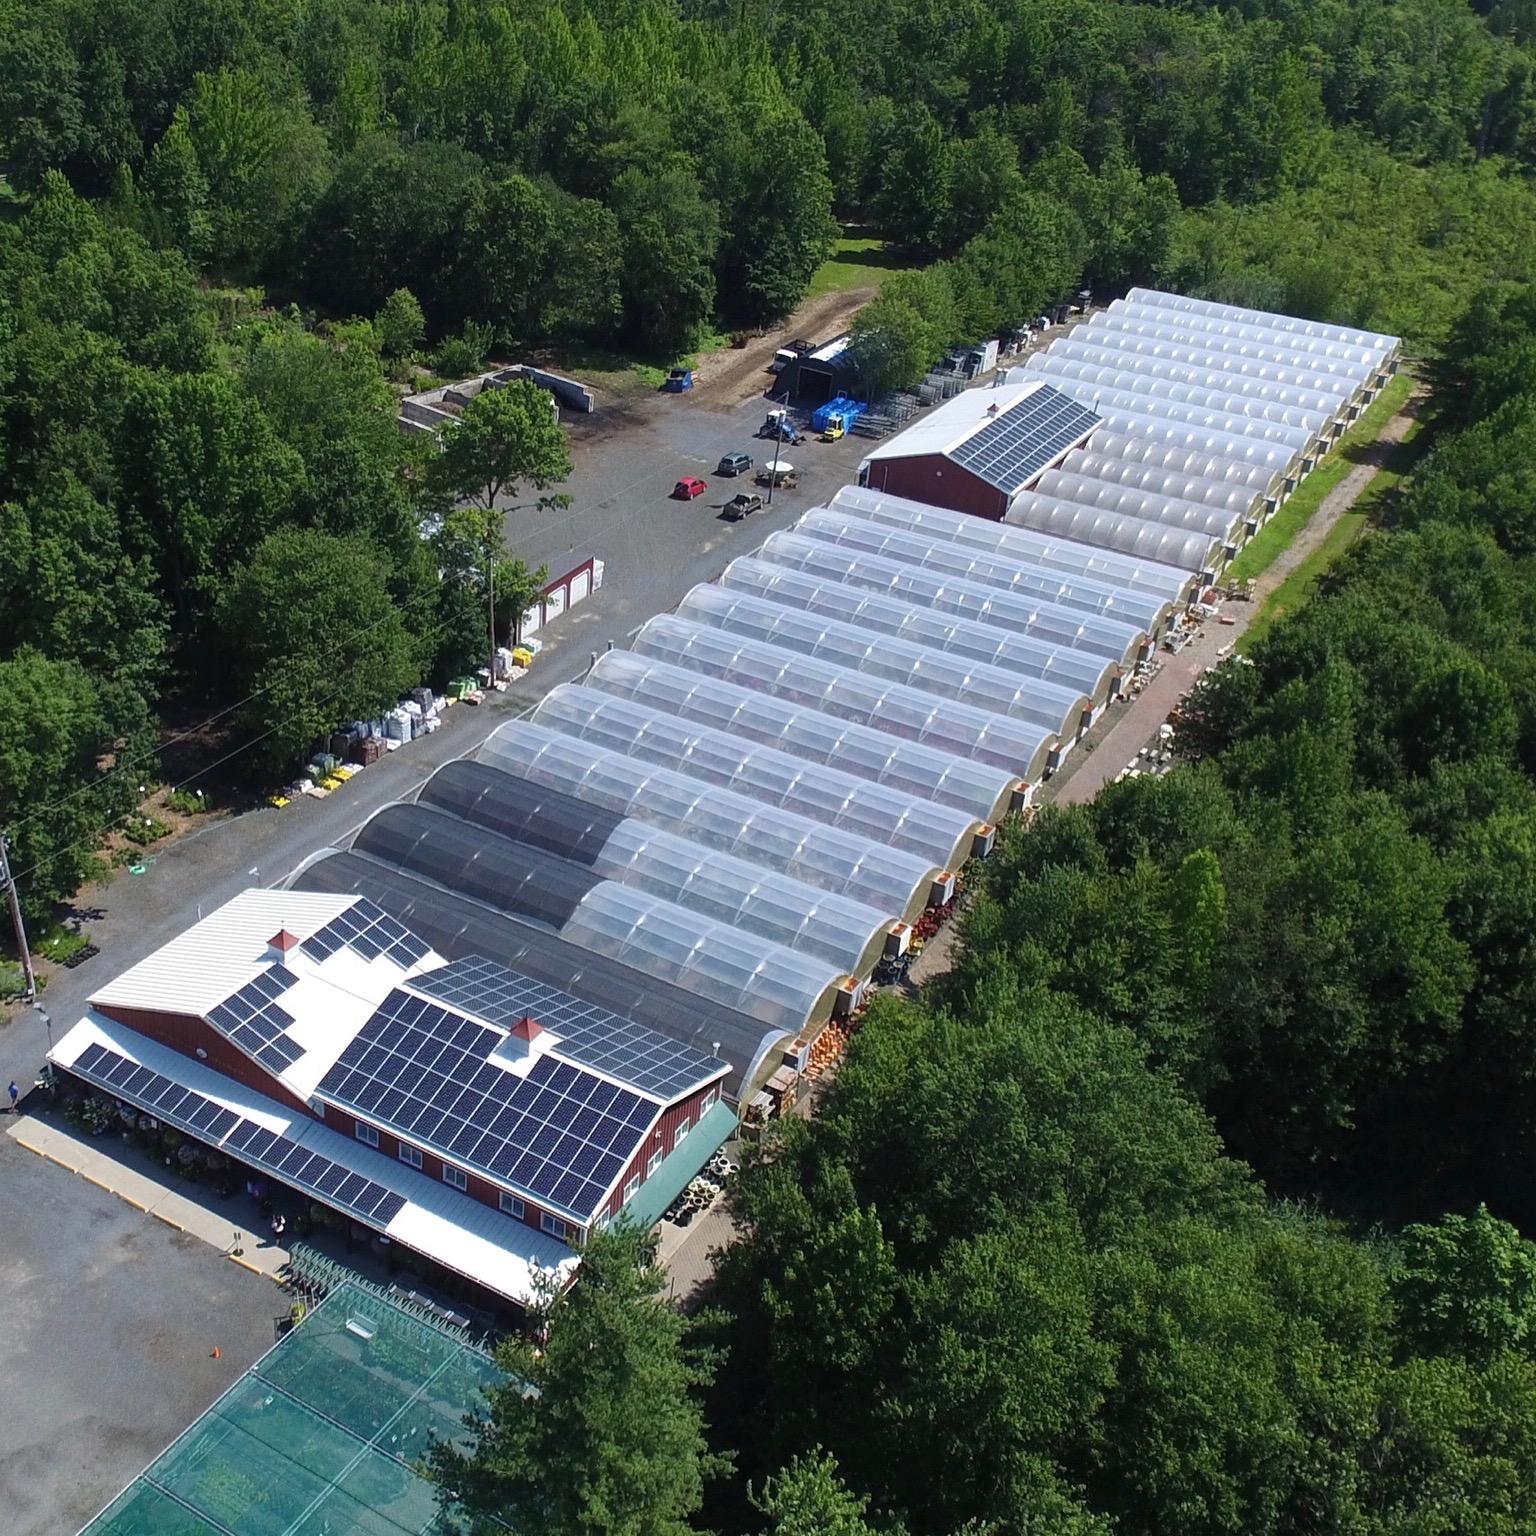 Commercial Solar Panel Installation In New Jersey Solar